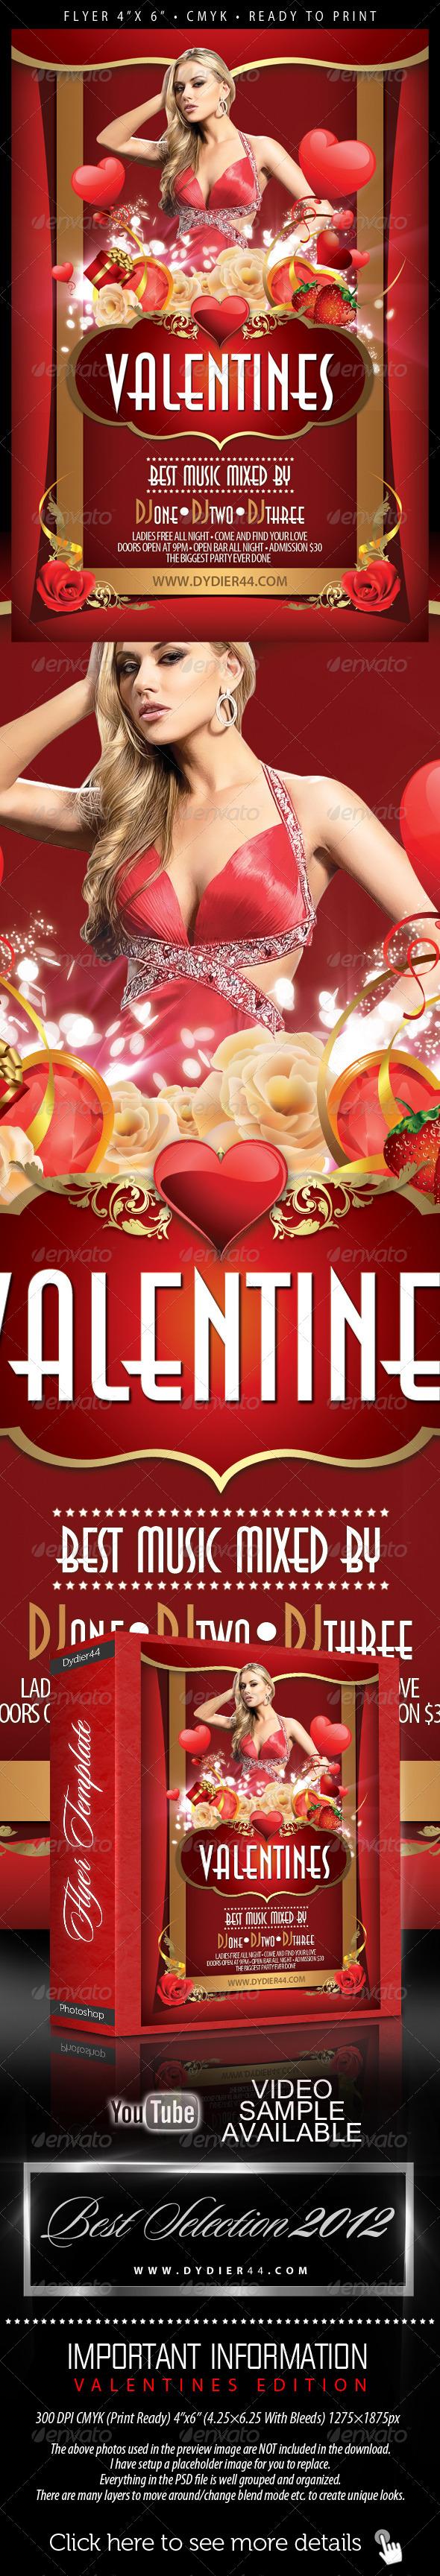 valentines speed dating birmingham